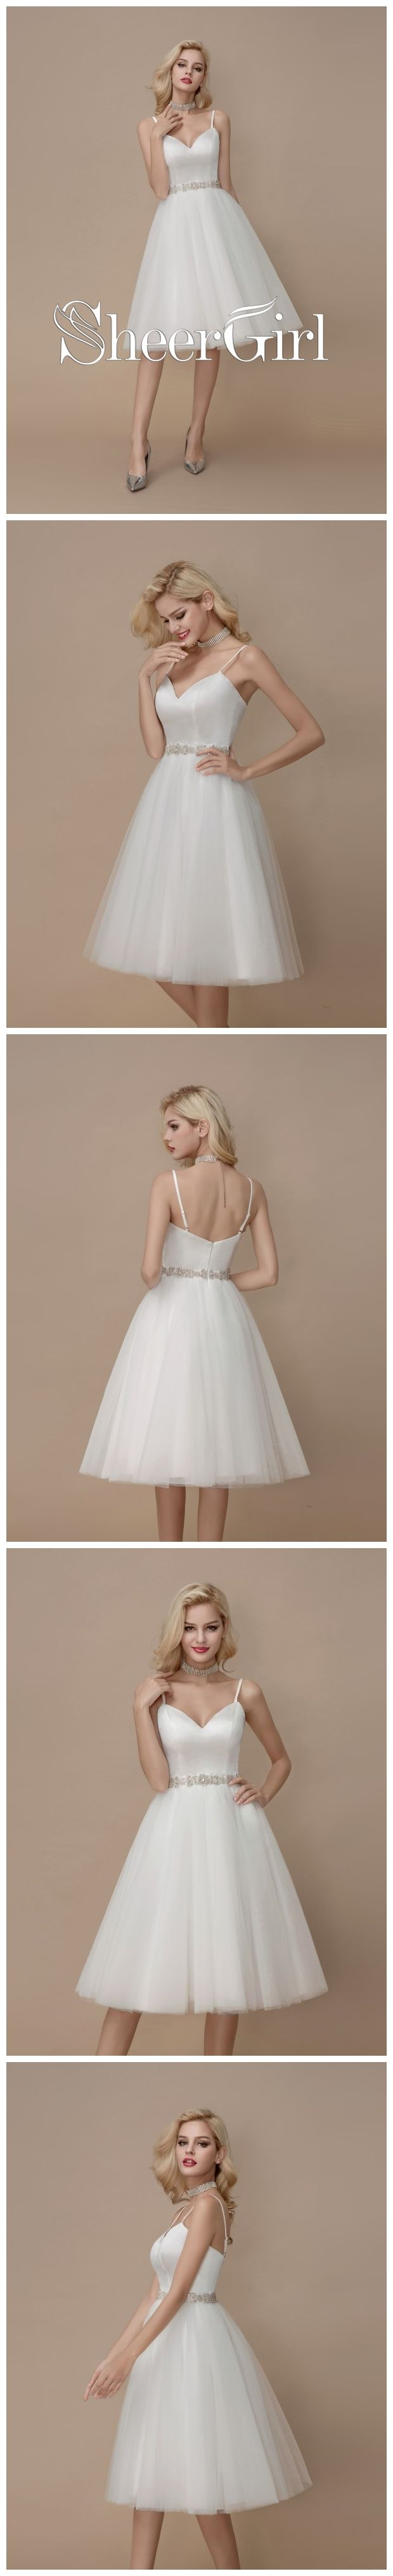 Knee length vintage wedding dresses  Knee Length Casual Wedding Dresses Beaded Short Summer Wedding